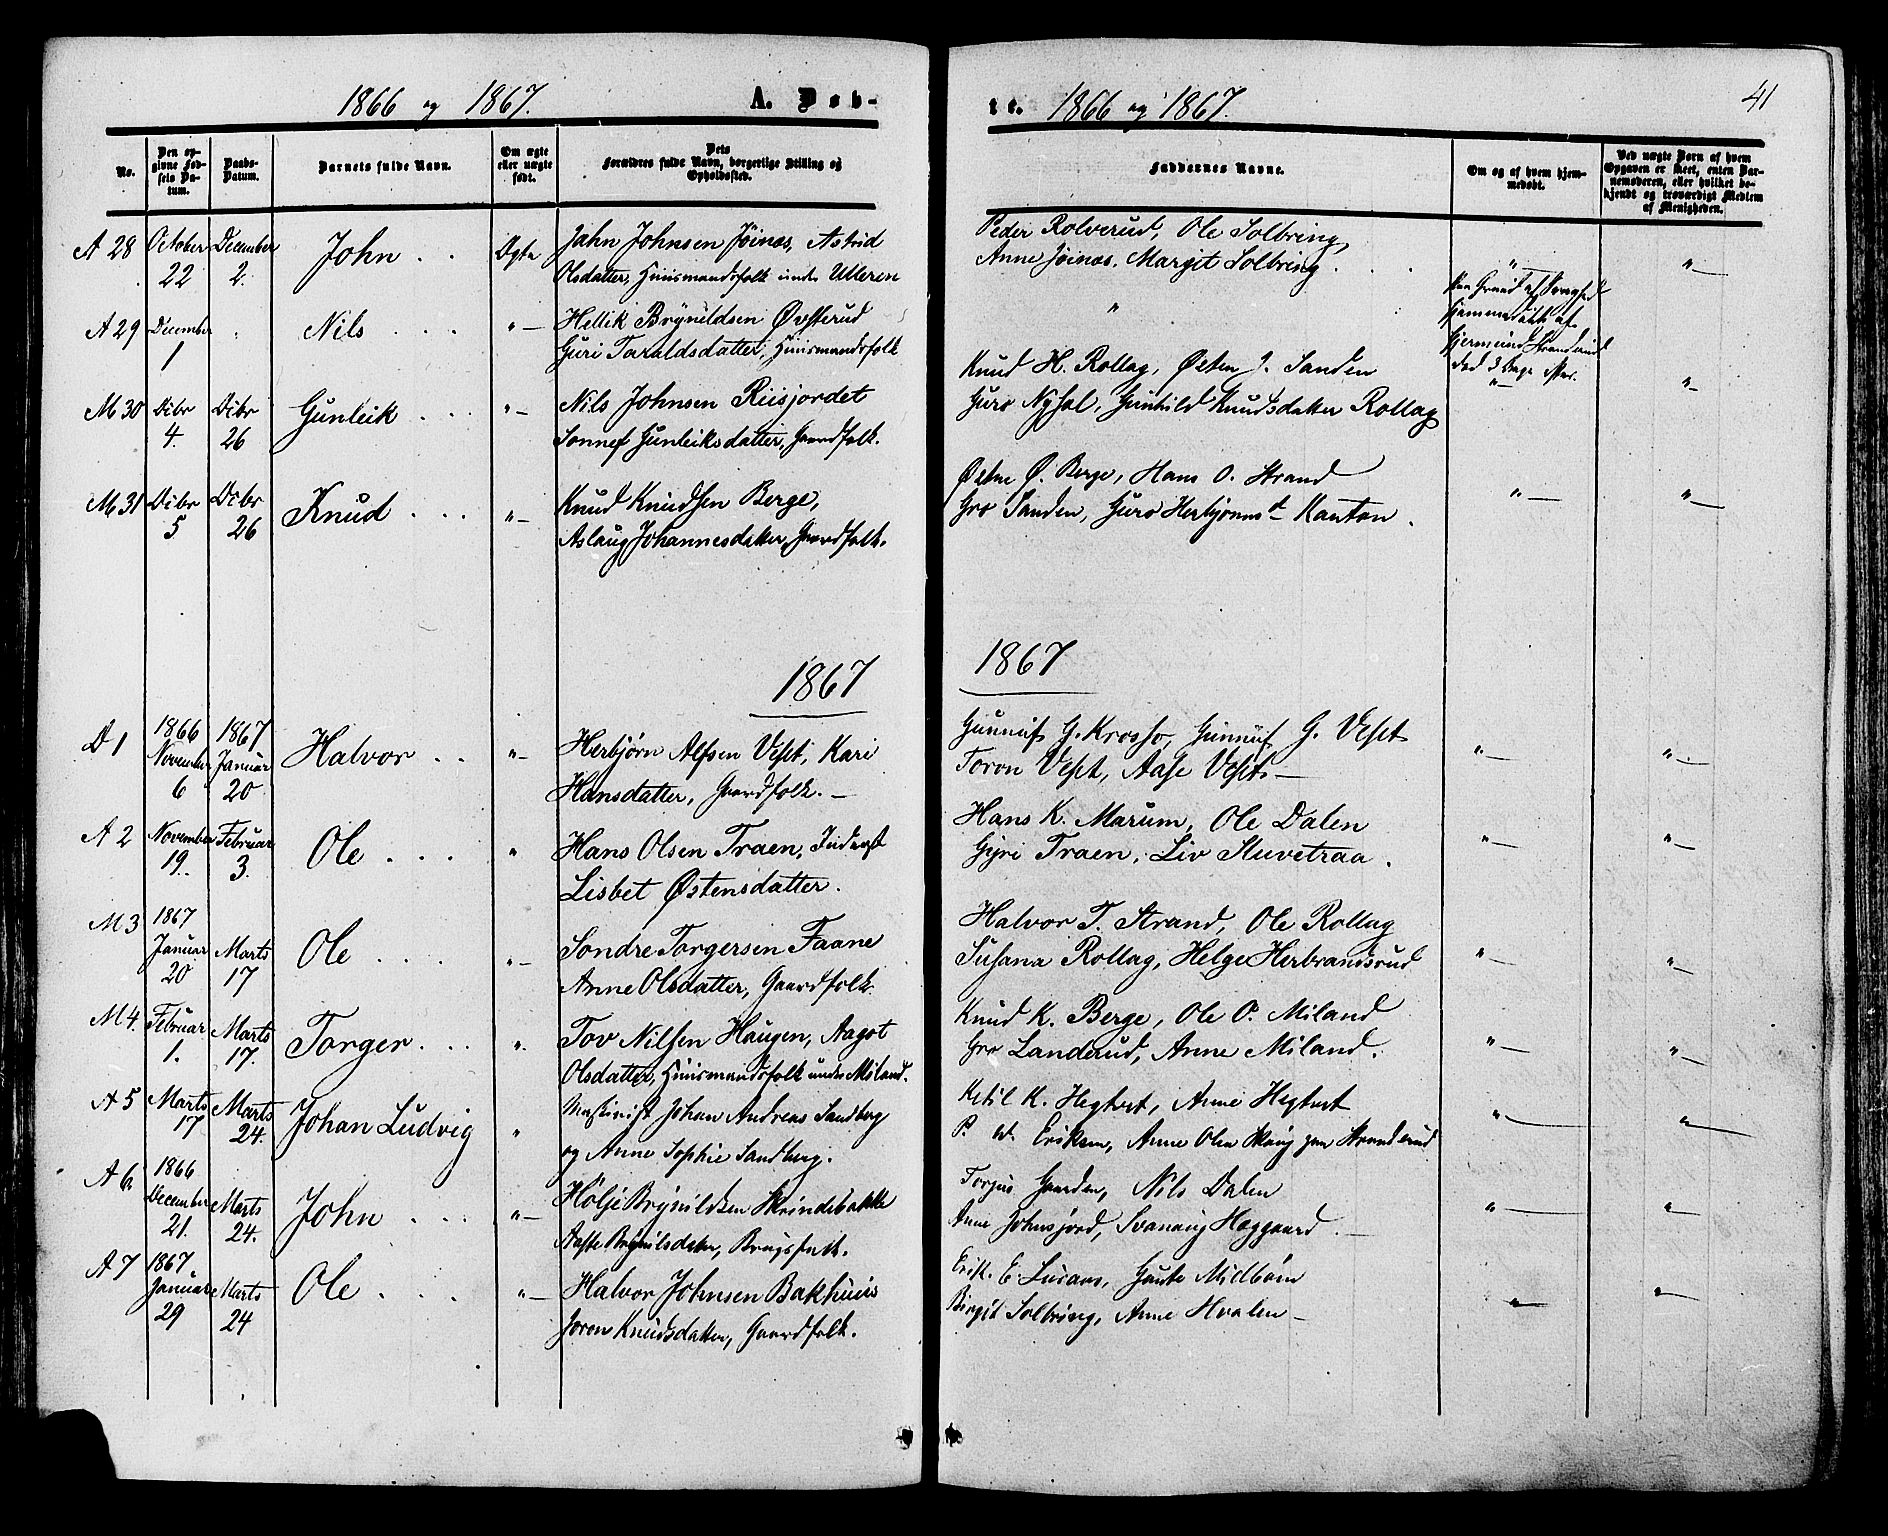 SAKO, Tinn kirkebøker, F/Fa/L0006: Ministerialbok nr. I 6, 1857-1878, s. 41